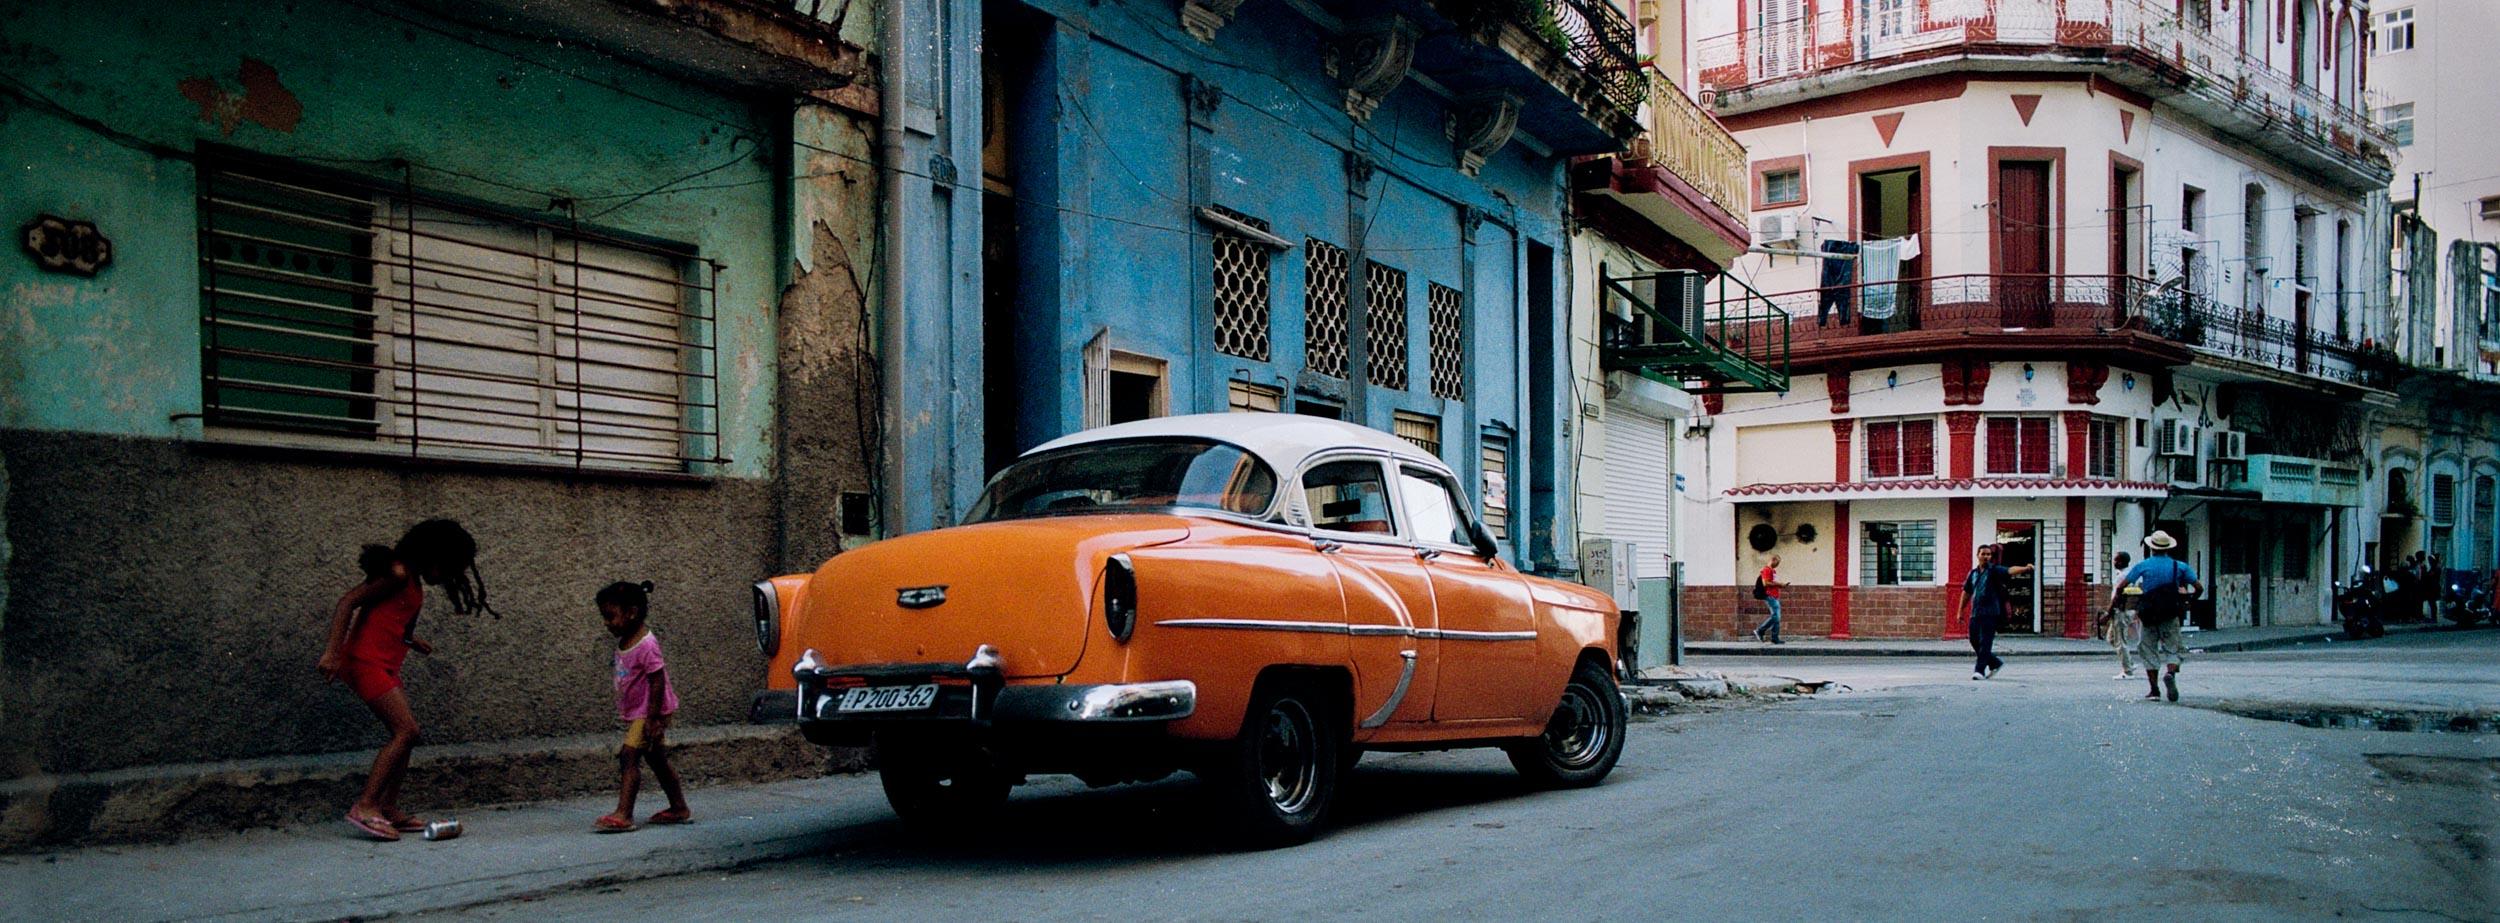 JackMcKain_Havana-.jpg